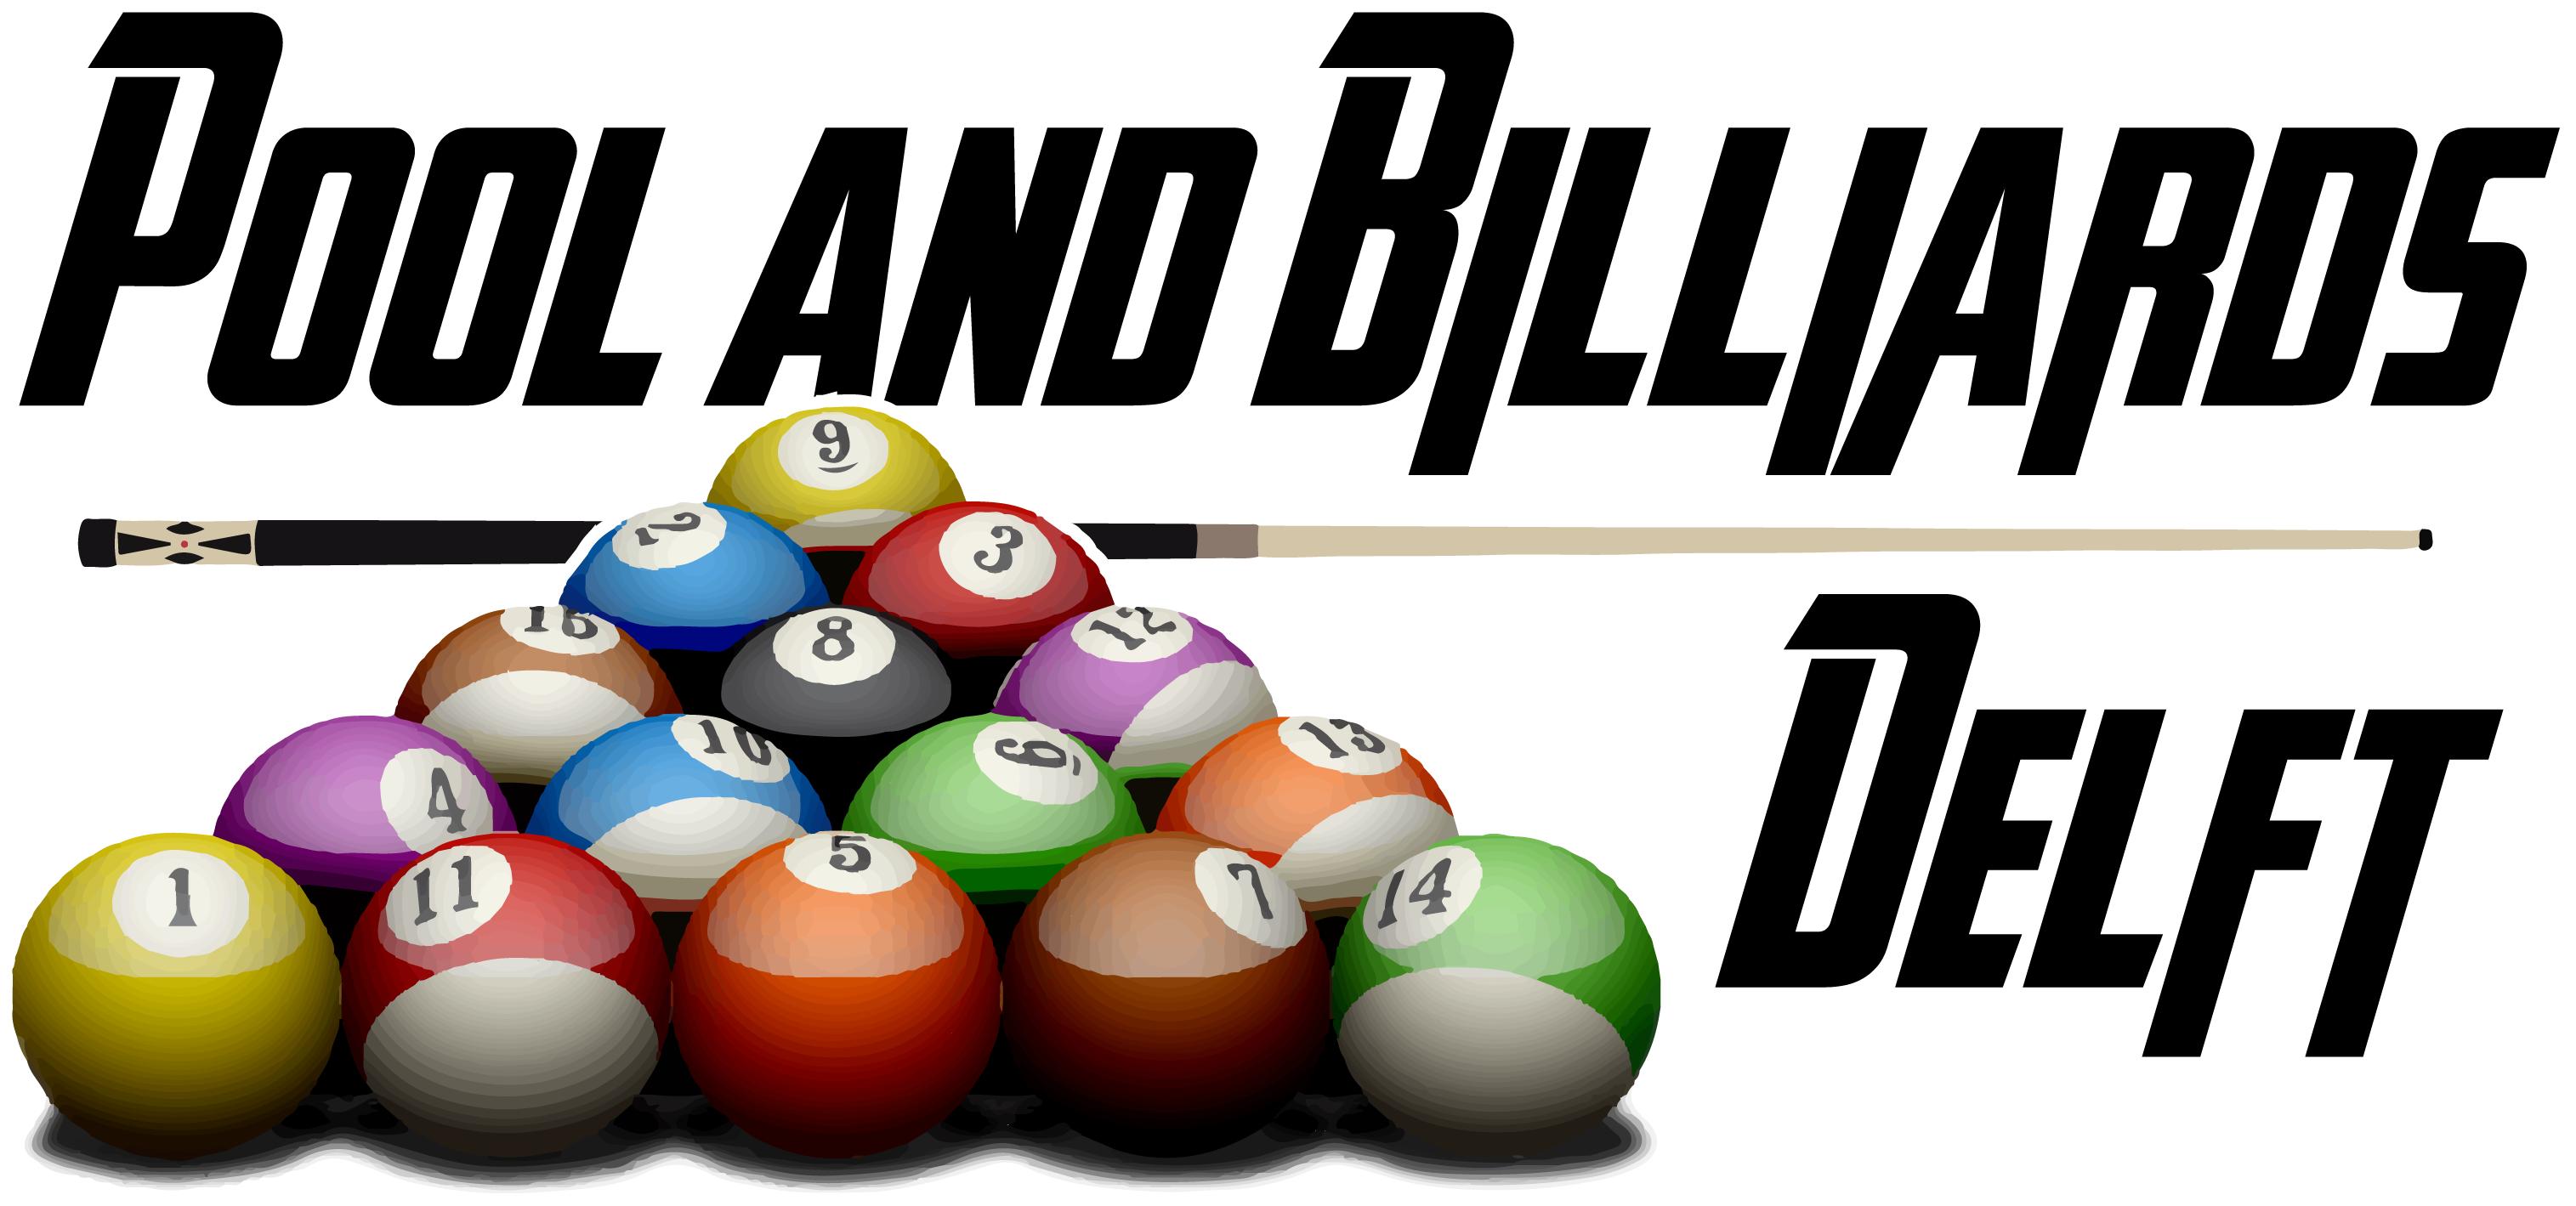 Pool and Billiards Delft